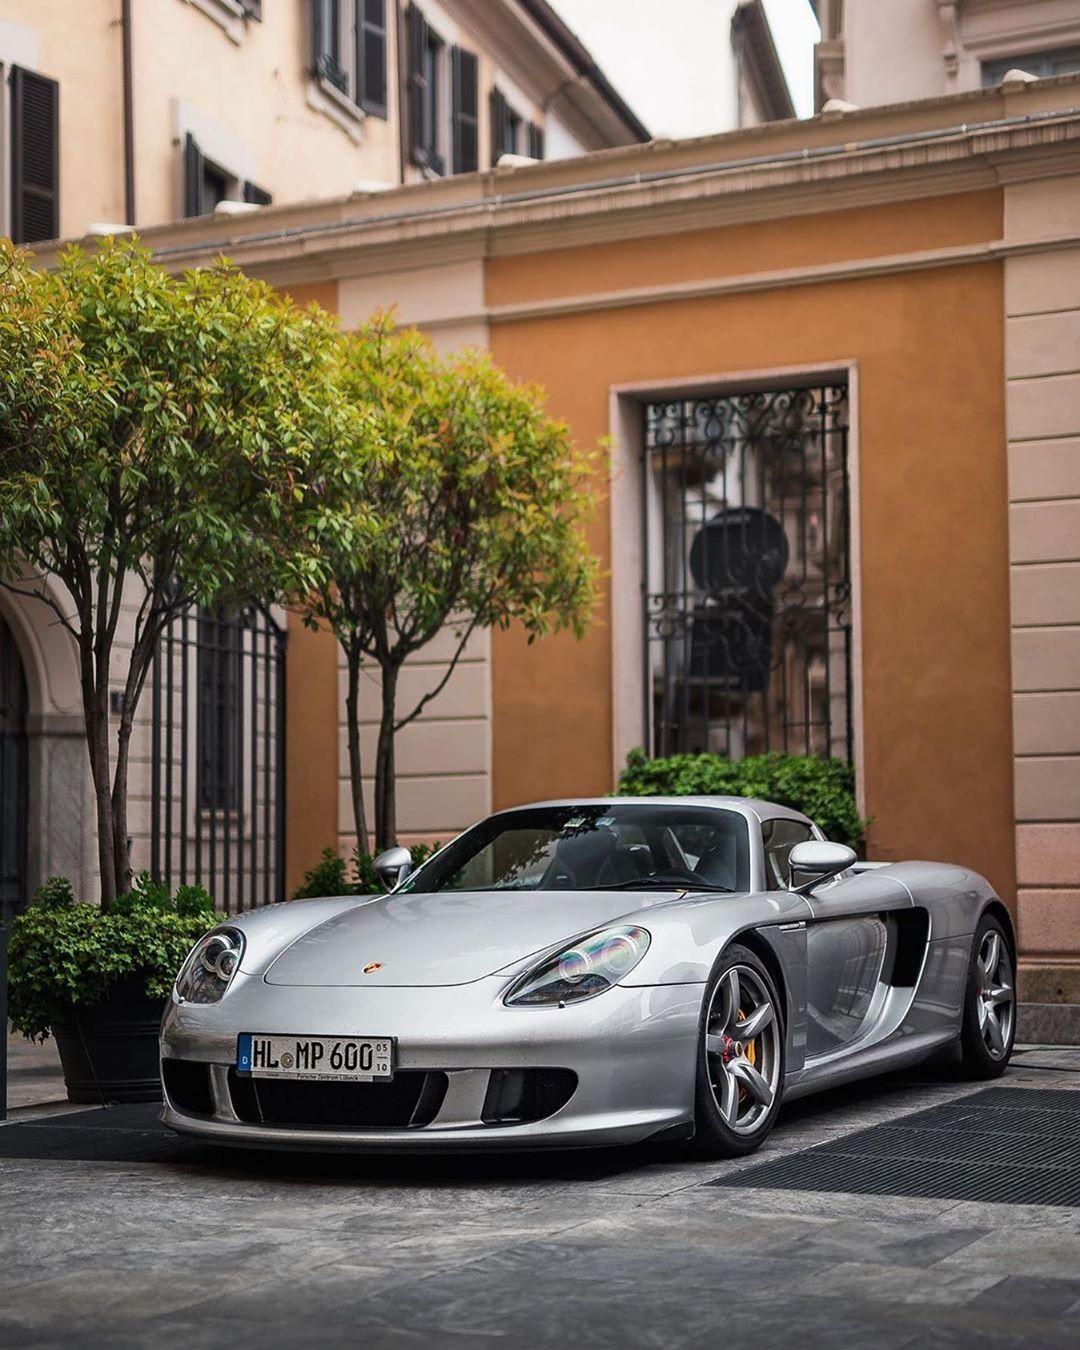 Pin By Lcss On Cars In 2020 Porsche Porsche Carrera Gt Best Luxury Cars